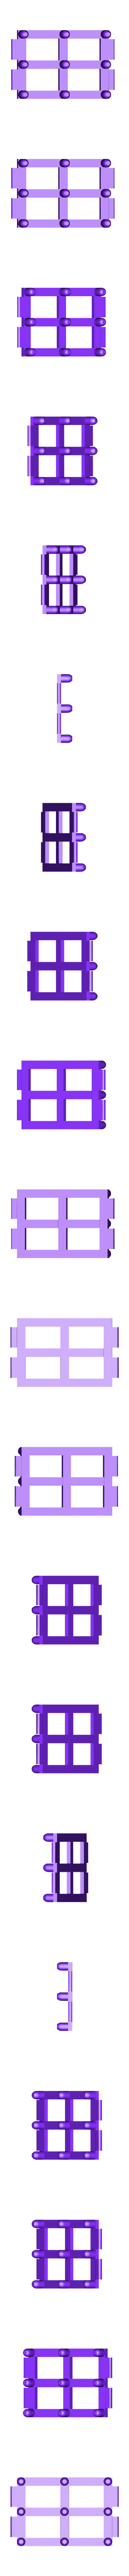 Romulan_harness_x3.stl Download free STL file Romulan Harness • 3D print template, poblocki1982